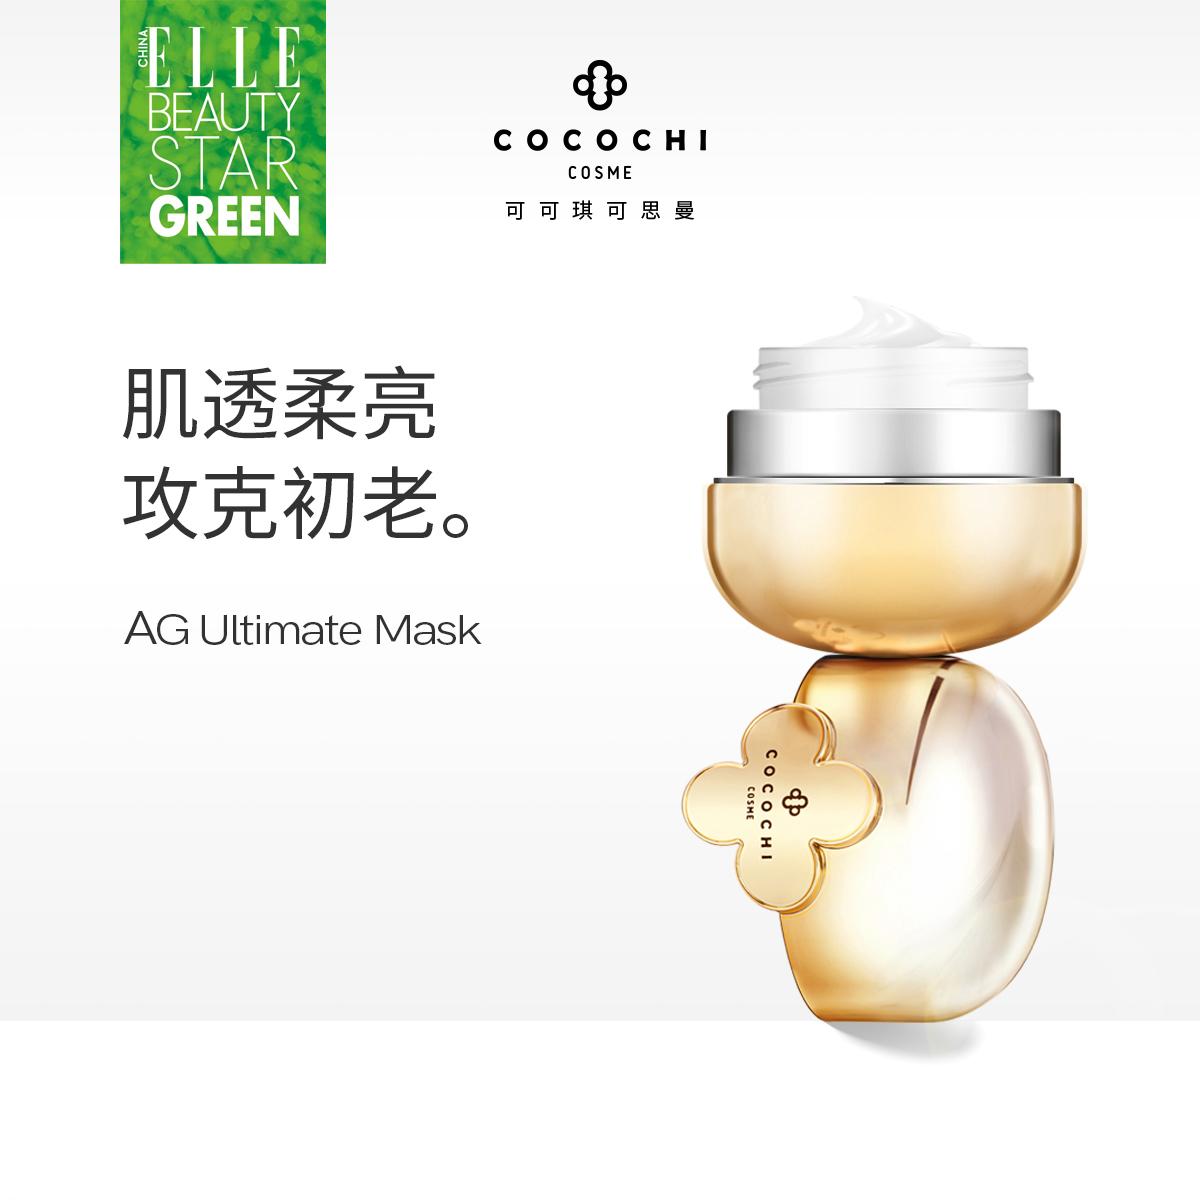 5032 cocochi日本AG面膜抗糖小金罐涂抹面膜女补水保湿官方正品